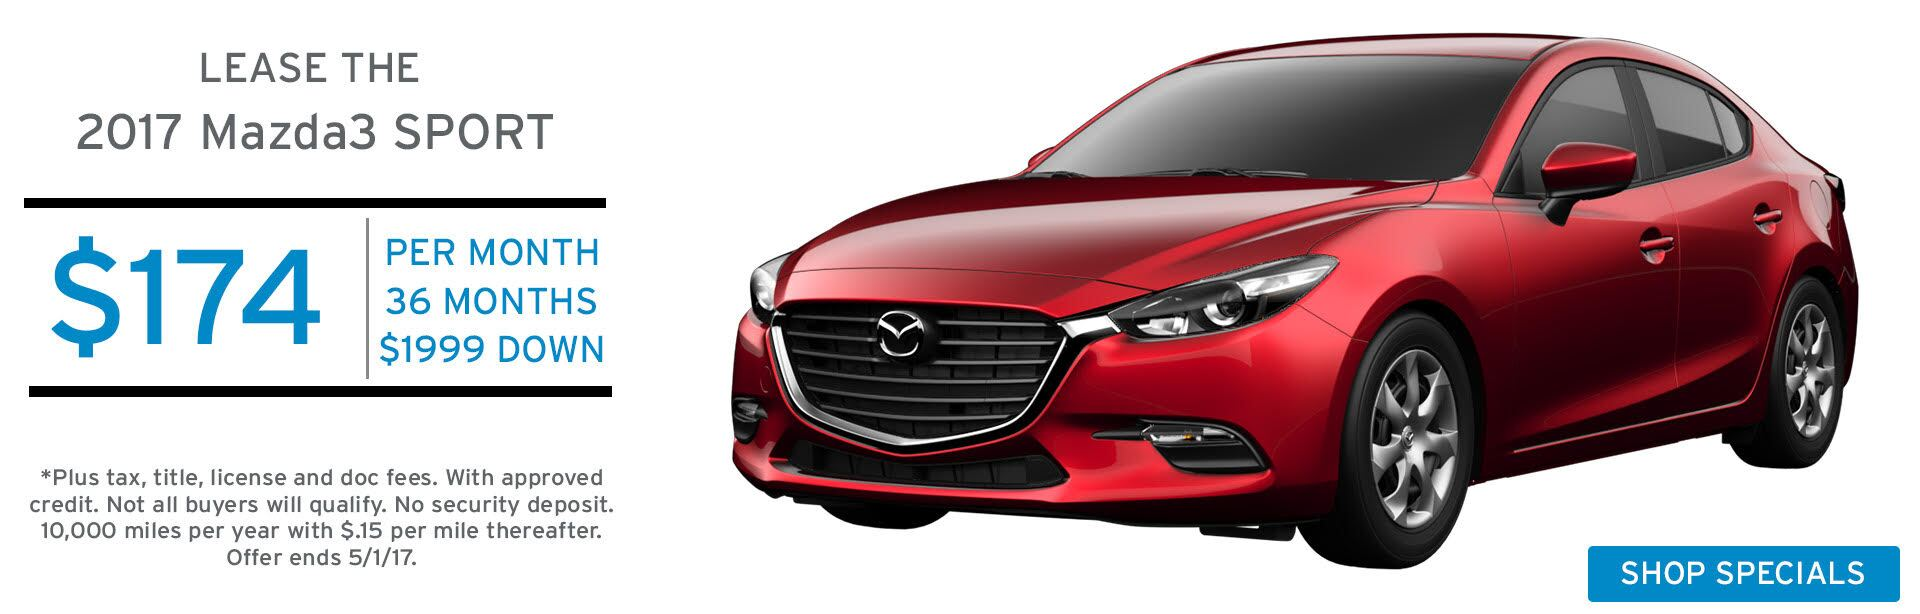 Germain Mazda Of Columbus Mazda Dealership In Ohio